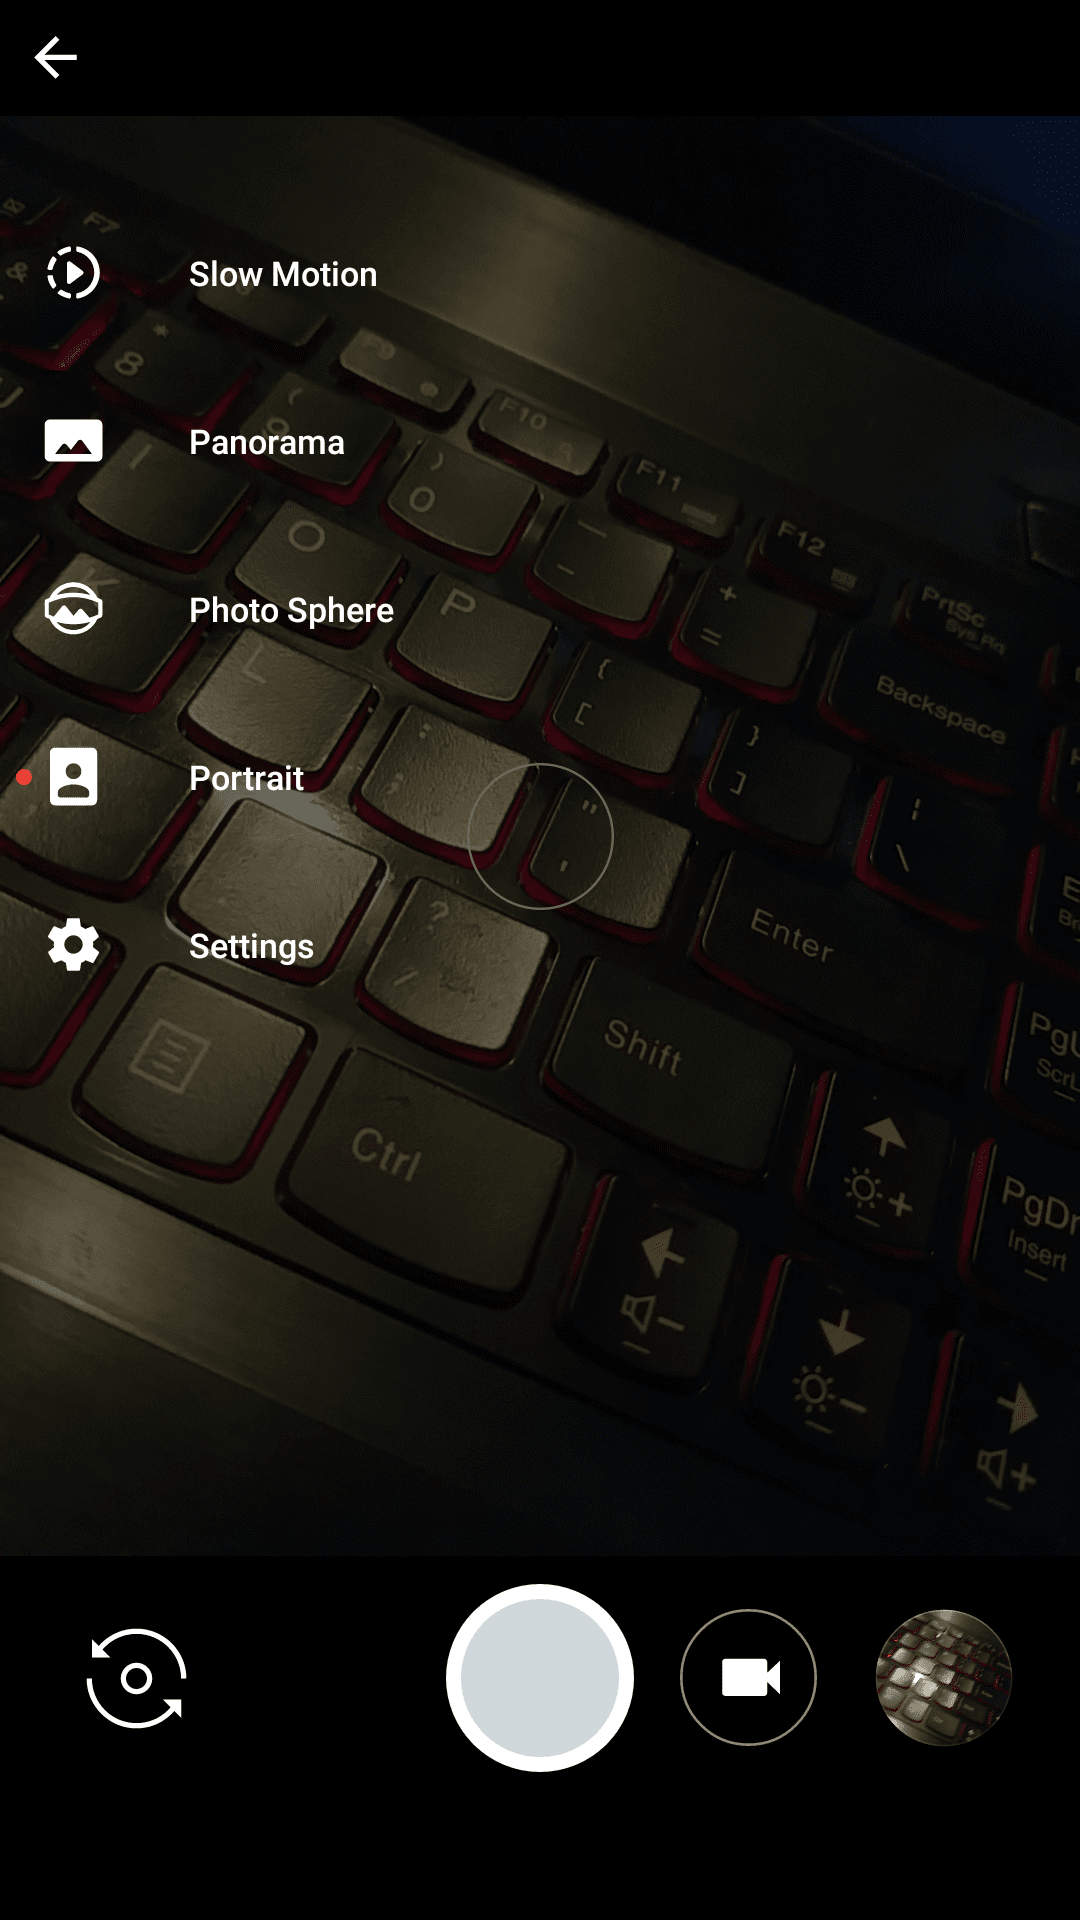 HOW TO: Install Google Camera on Poco F1, Mi 8 [Portrait Mode]